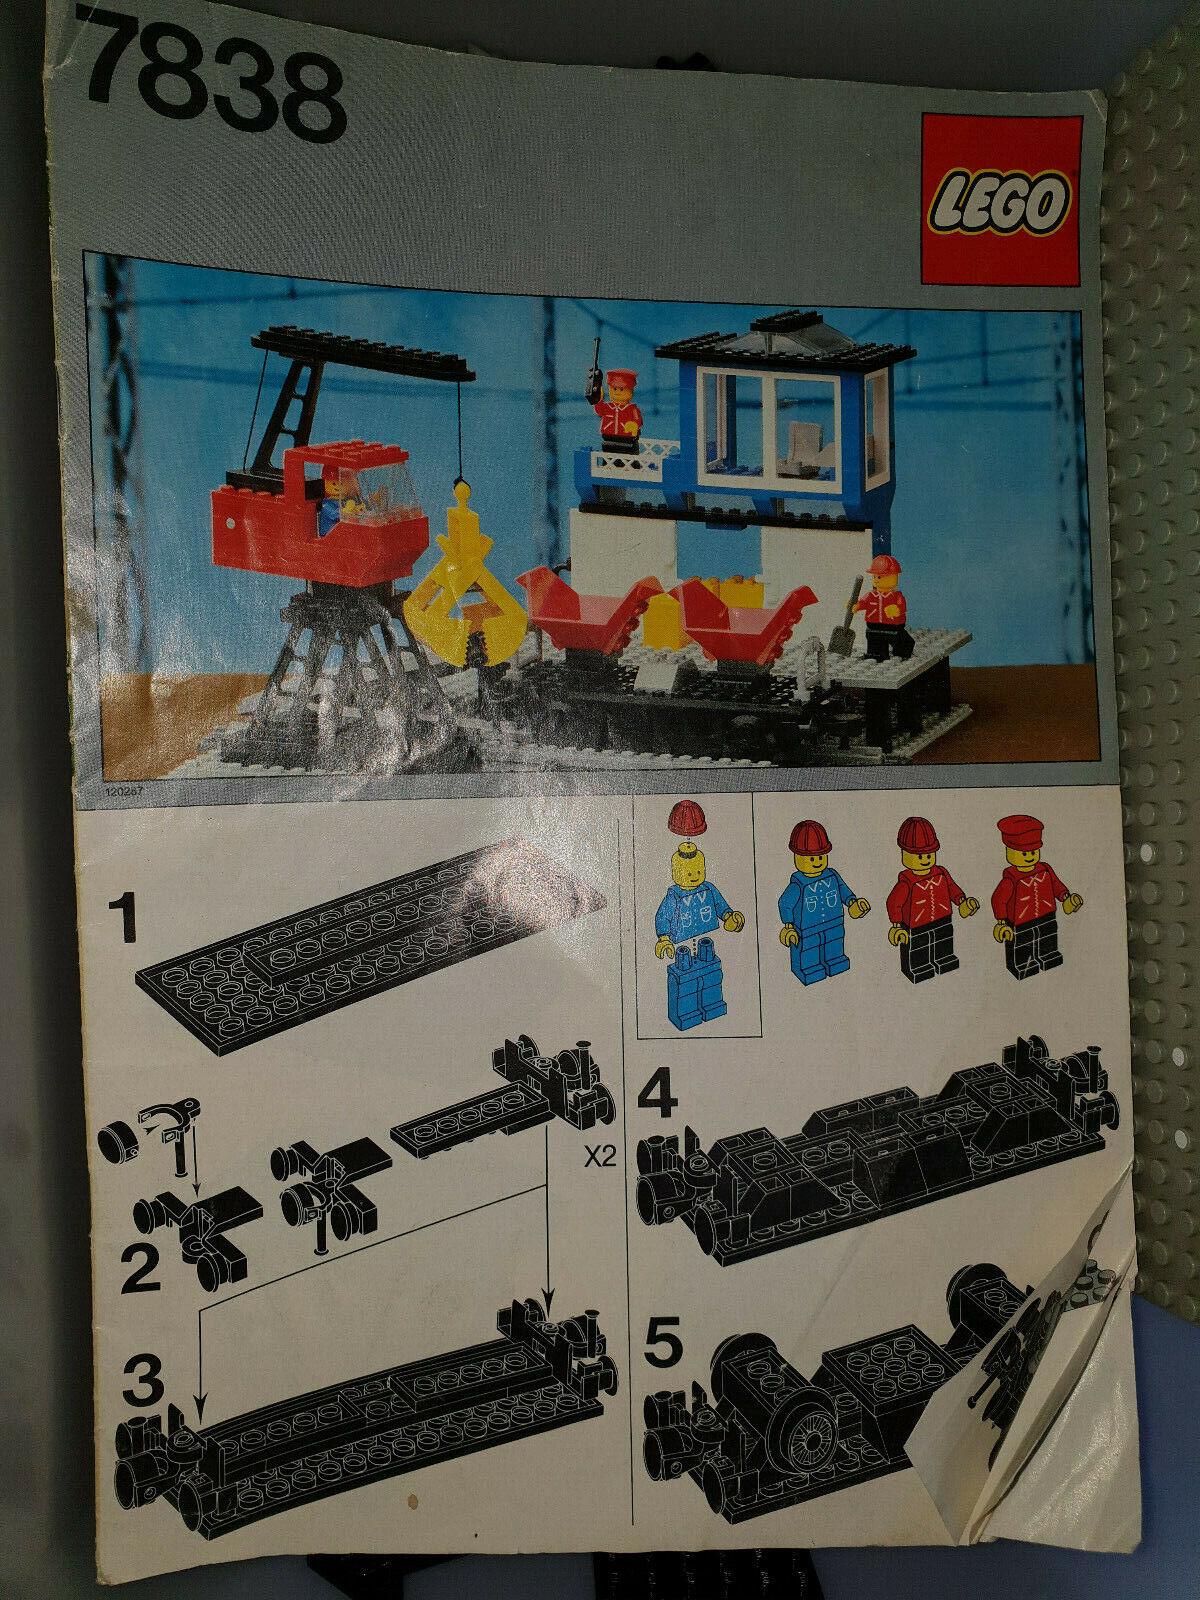 Lego Freight Loading Depot 7838